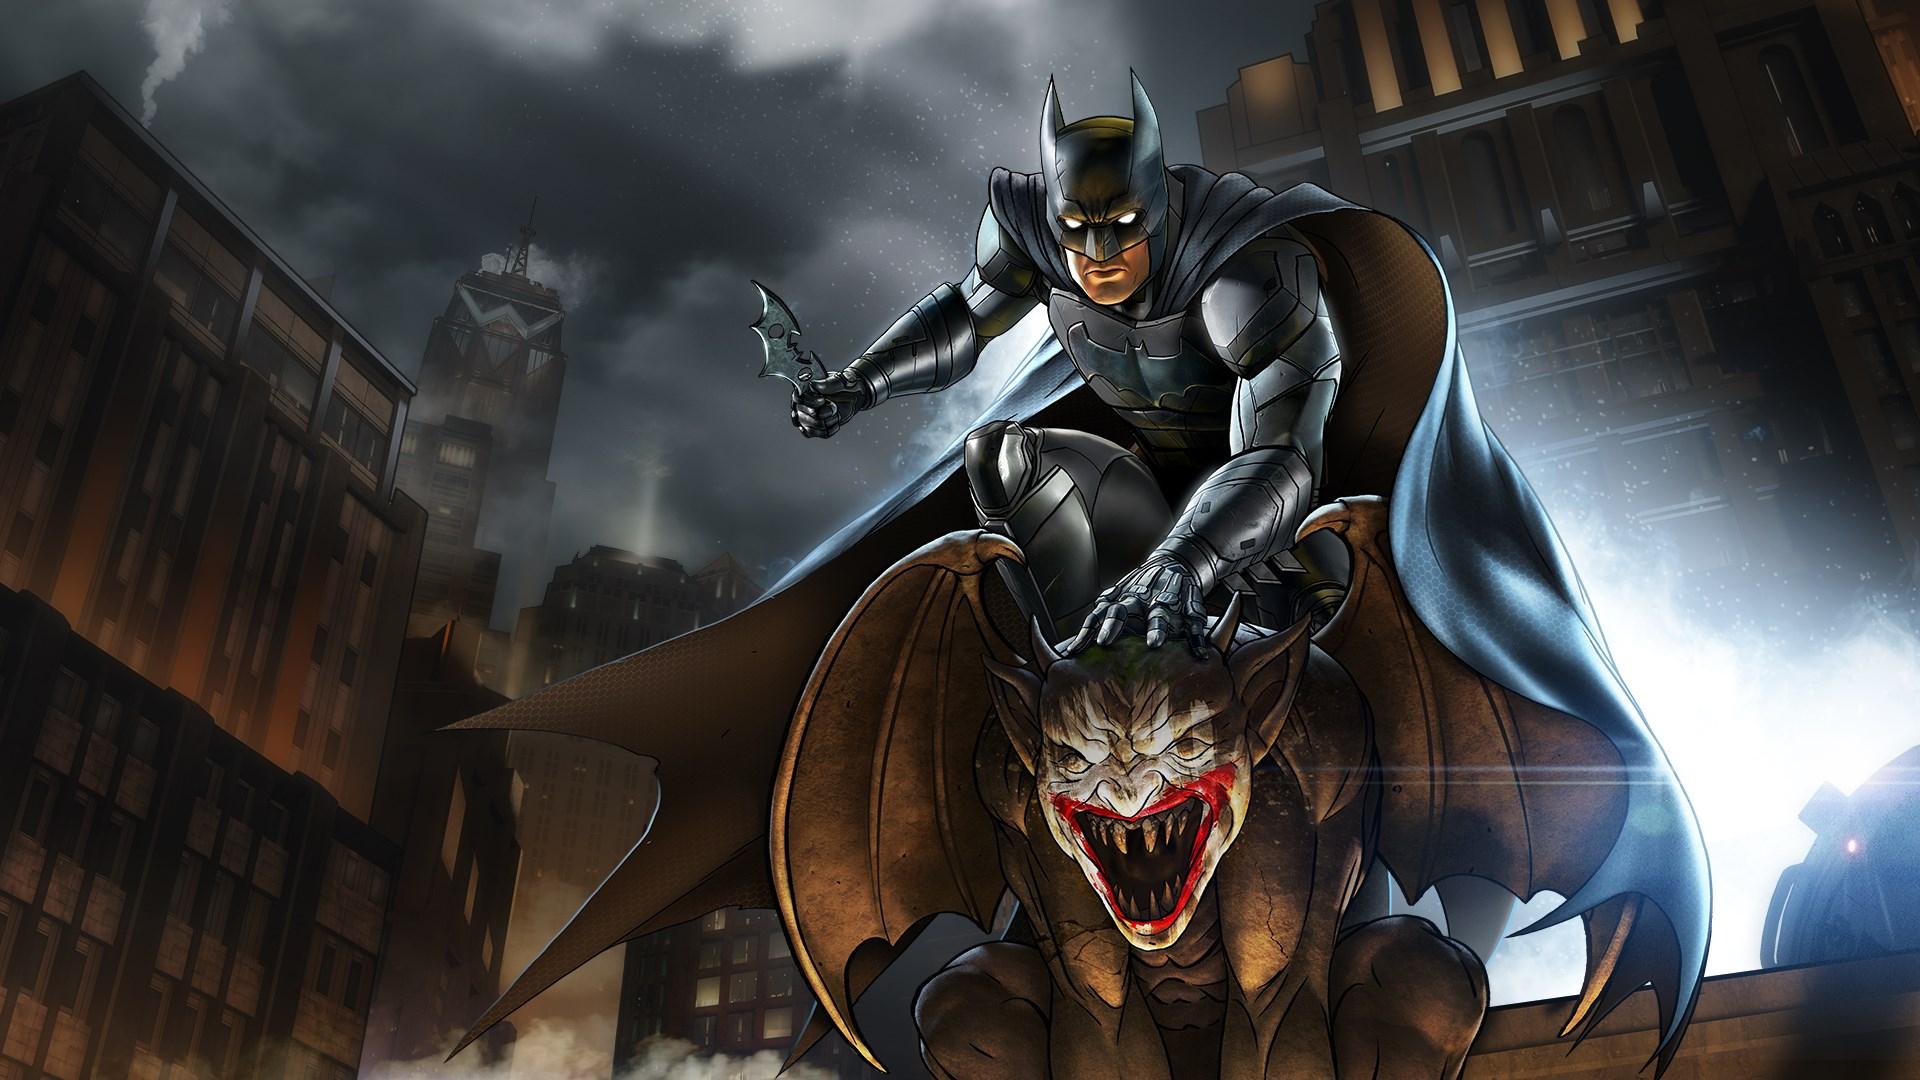 Batman: The Enemy Within - The Telltale Series EP1 GRATIS En la Tienda de Microsoft